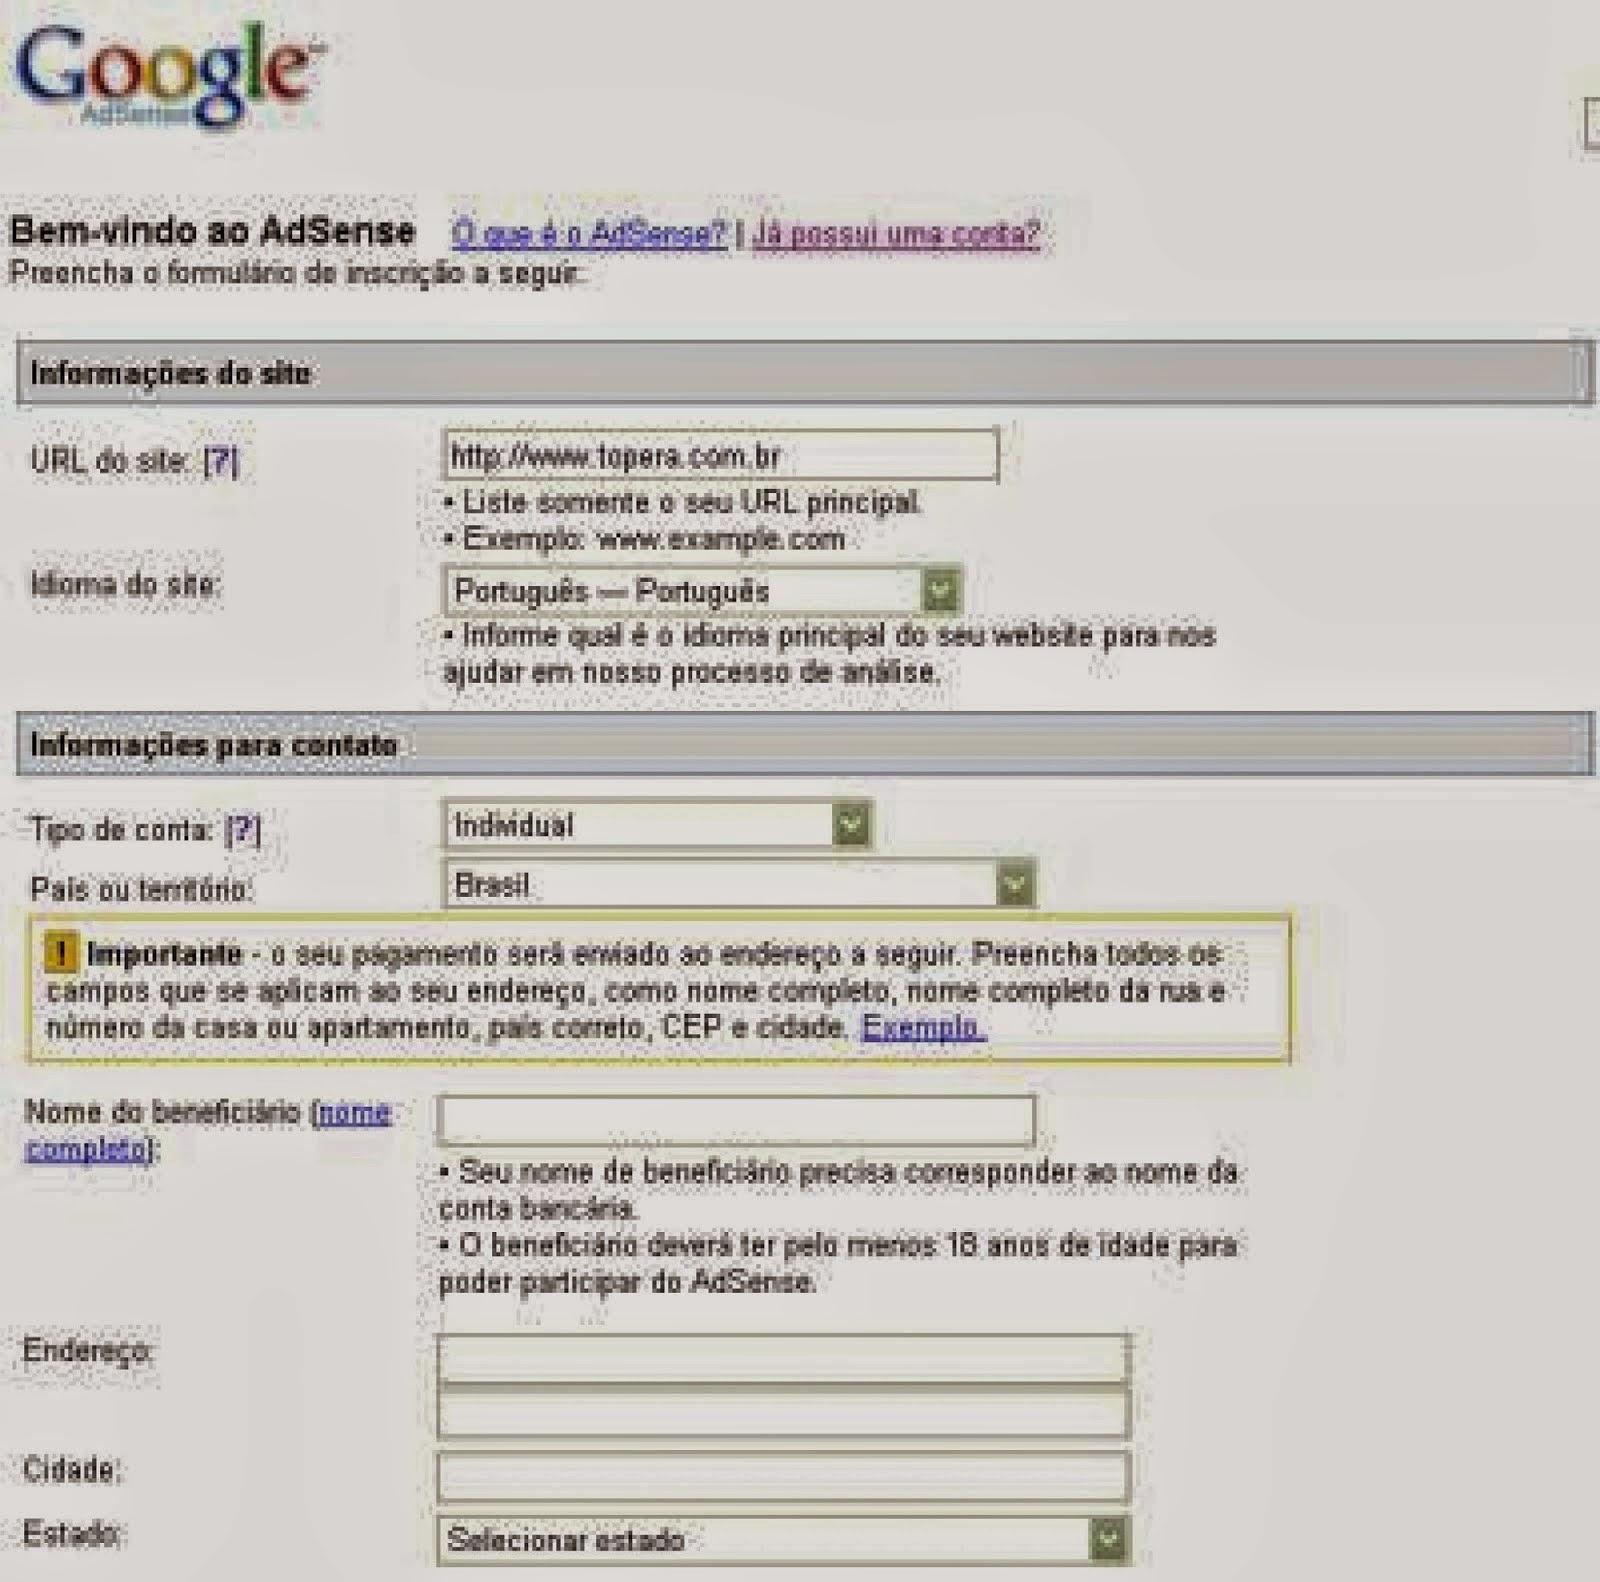 Google Adsense cadastro